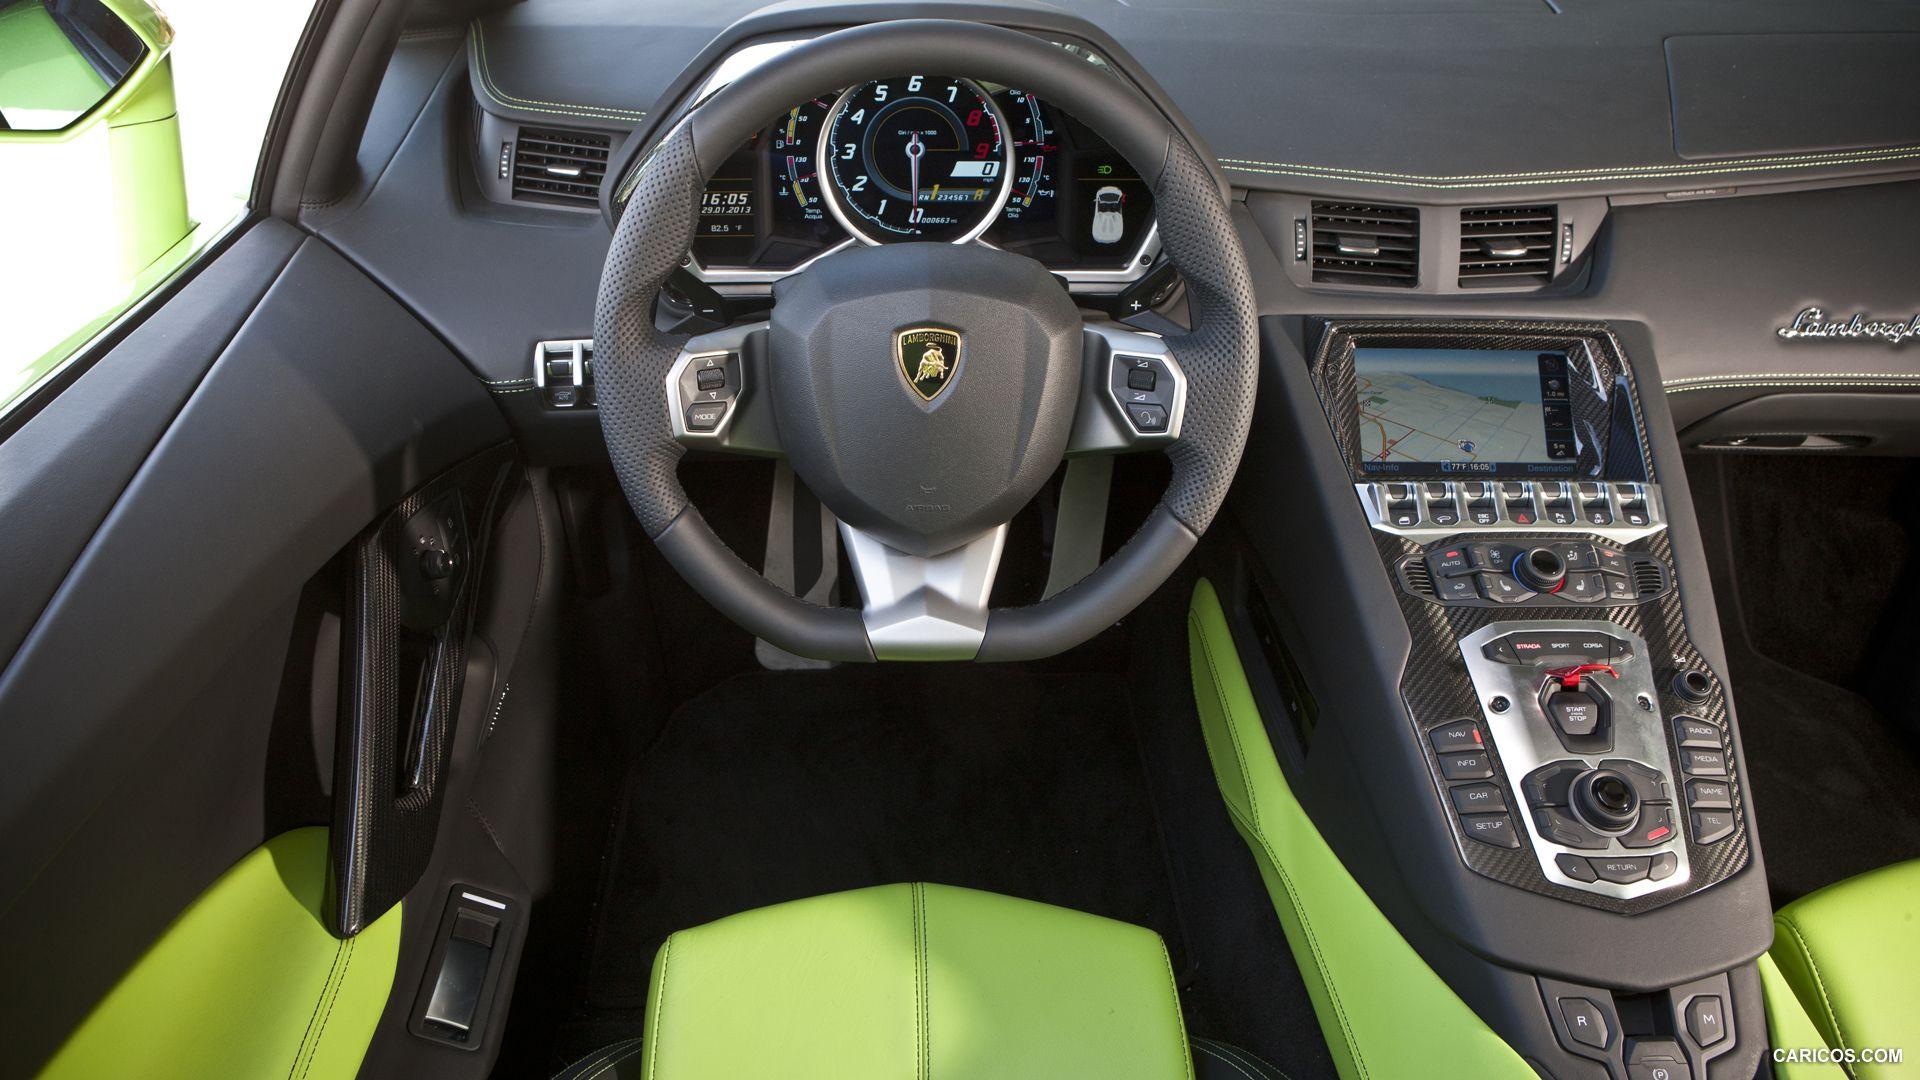 2014 Lamborghini Aventador LP 700-4 Roadster - Interior Detail   All ...